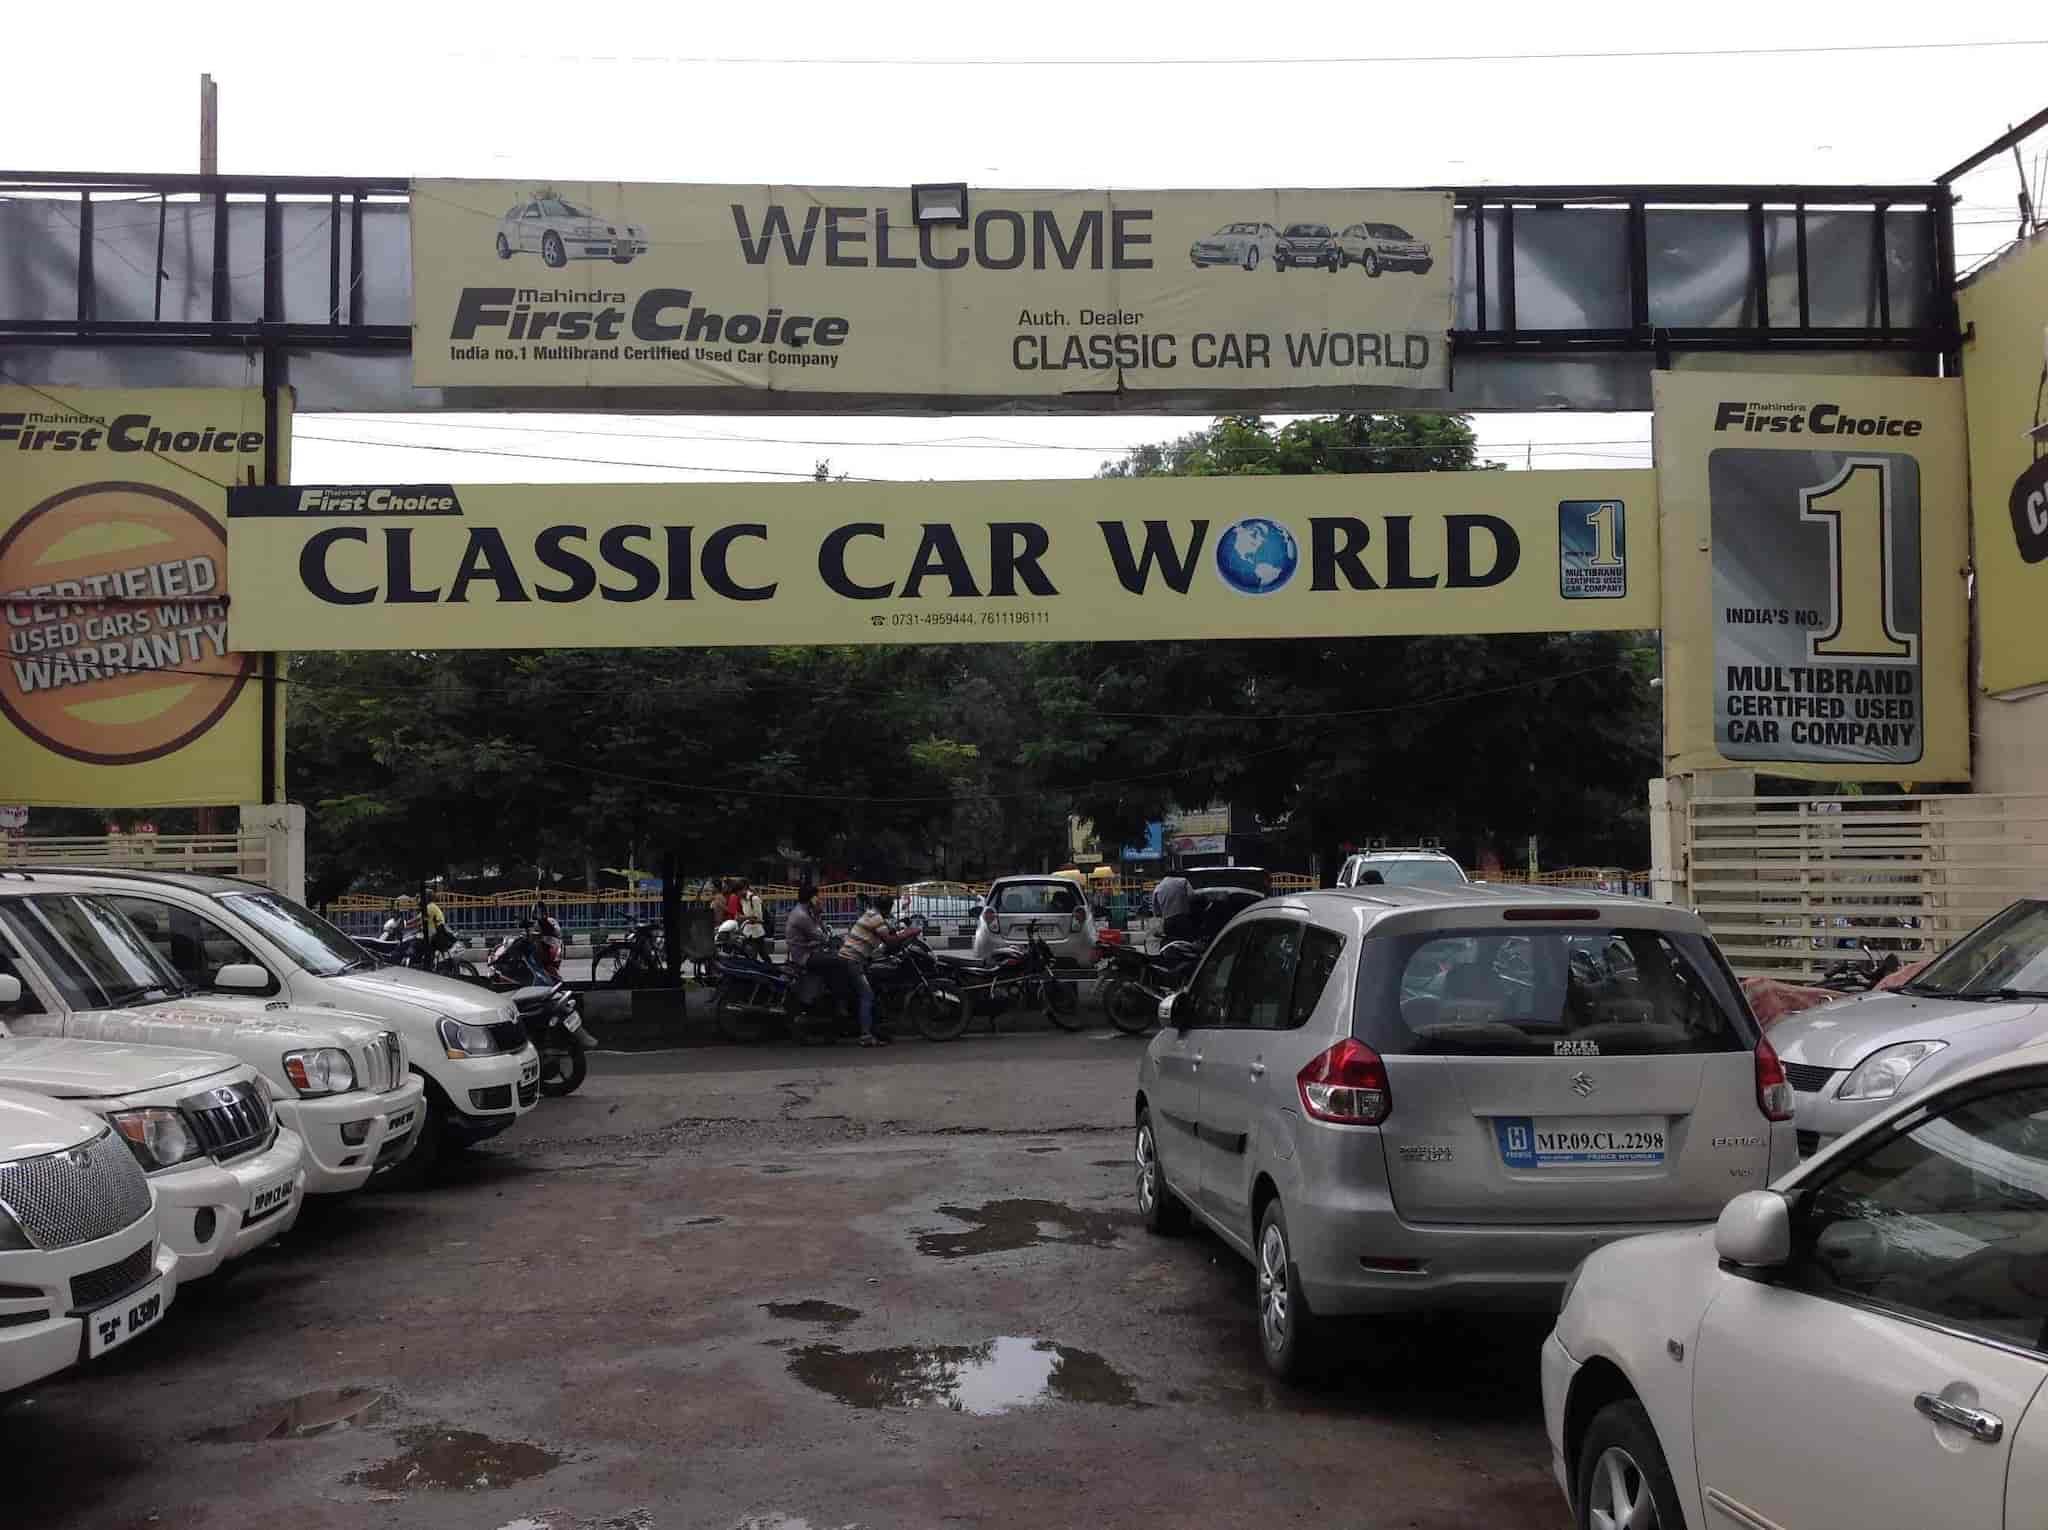 Classic Car World Mahindra First Choice Reviews Bhawar Kuan Indore